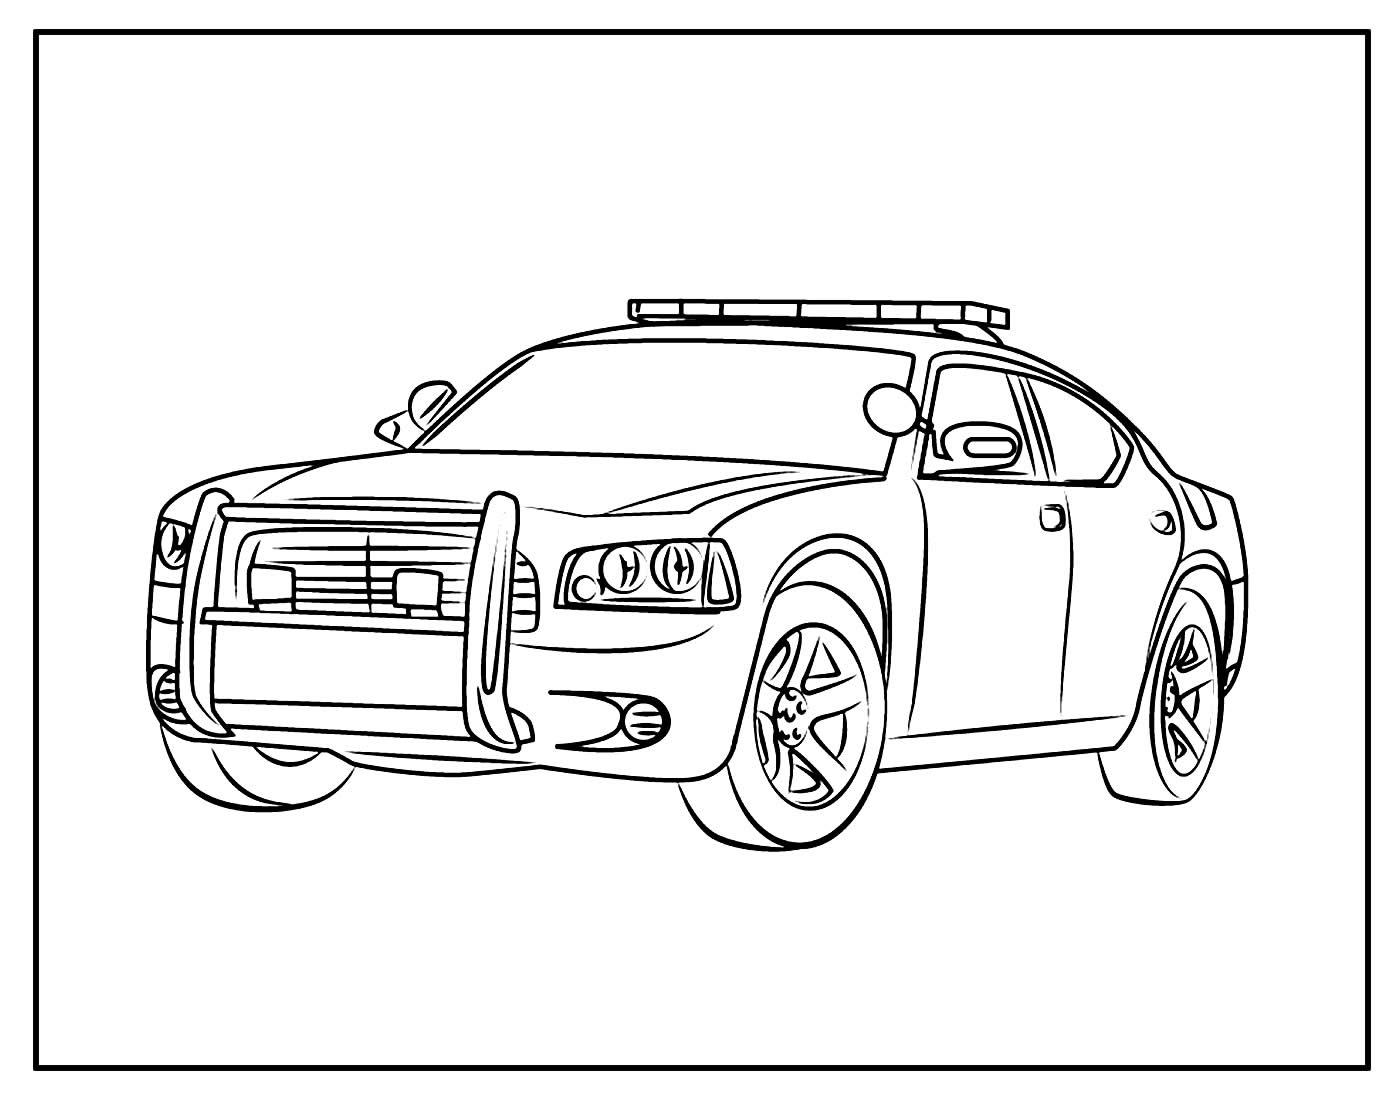 Página para colorir e pintar de Carro